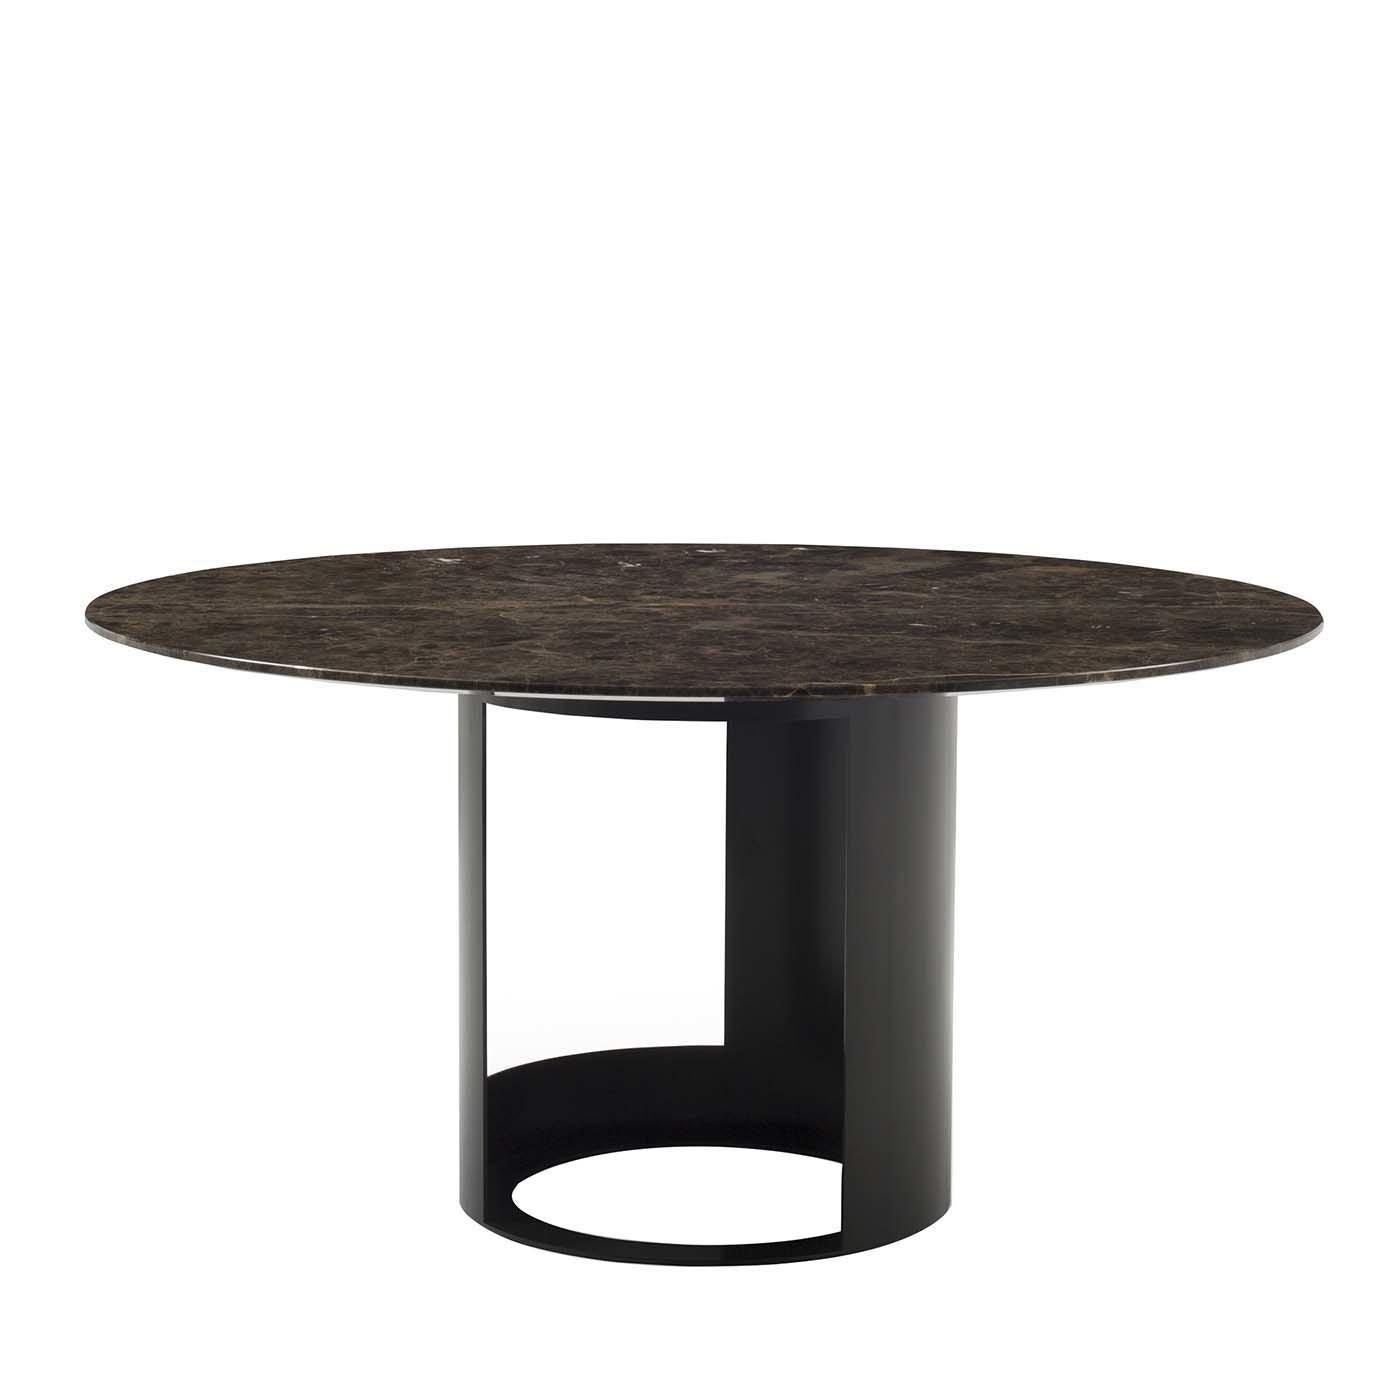 Ci Dining Table in Brown Emperador Marble